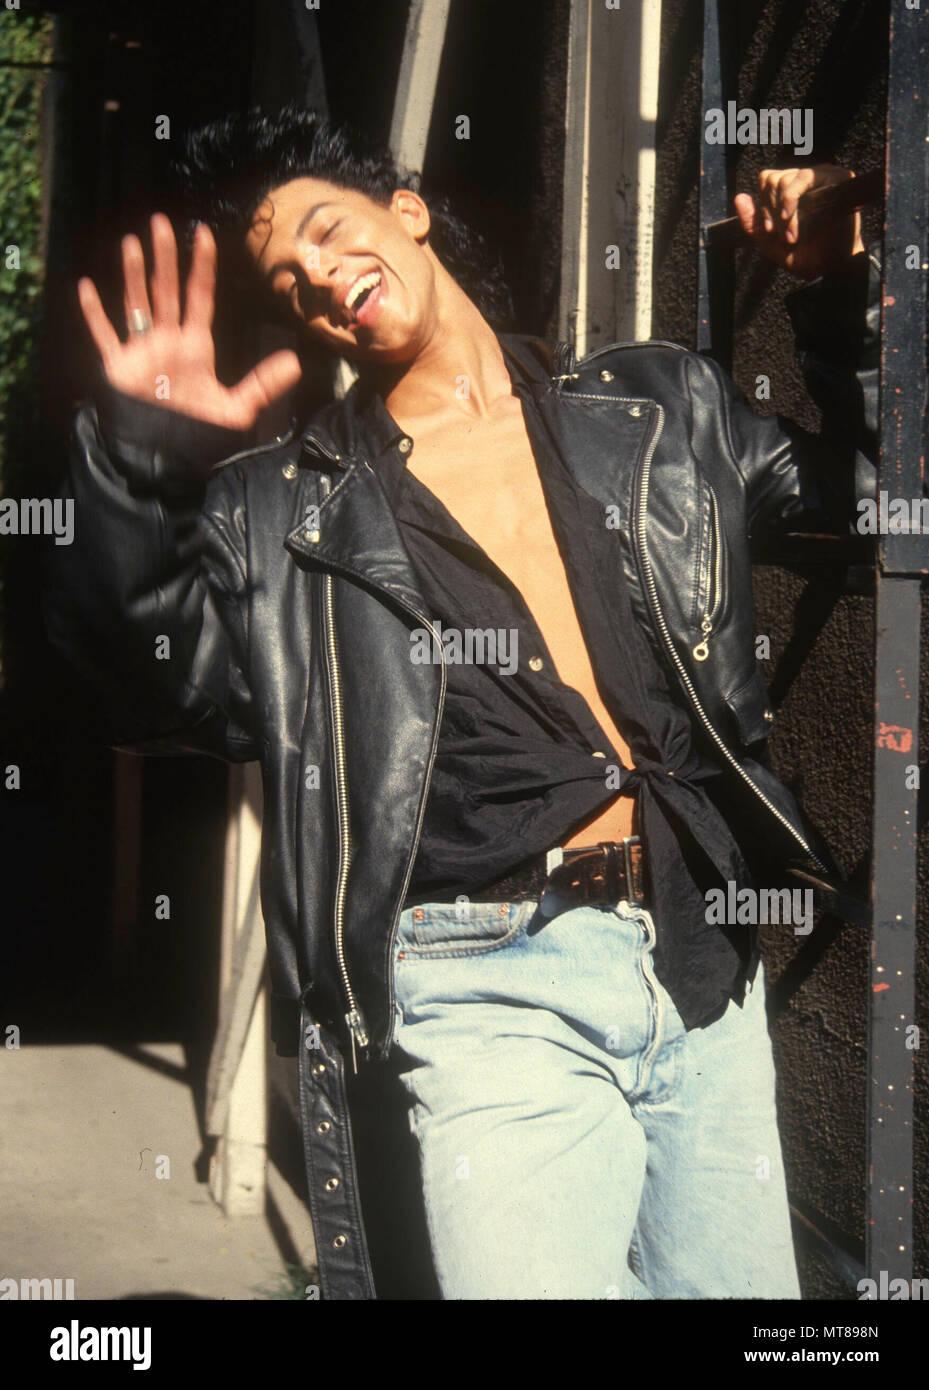 Jaime King USA 2 1998-1999